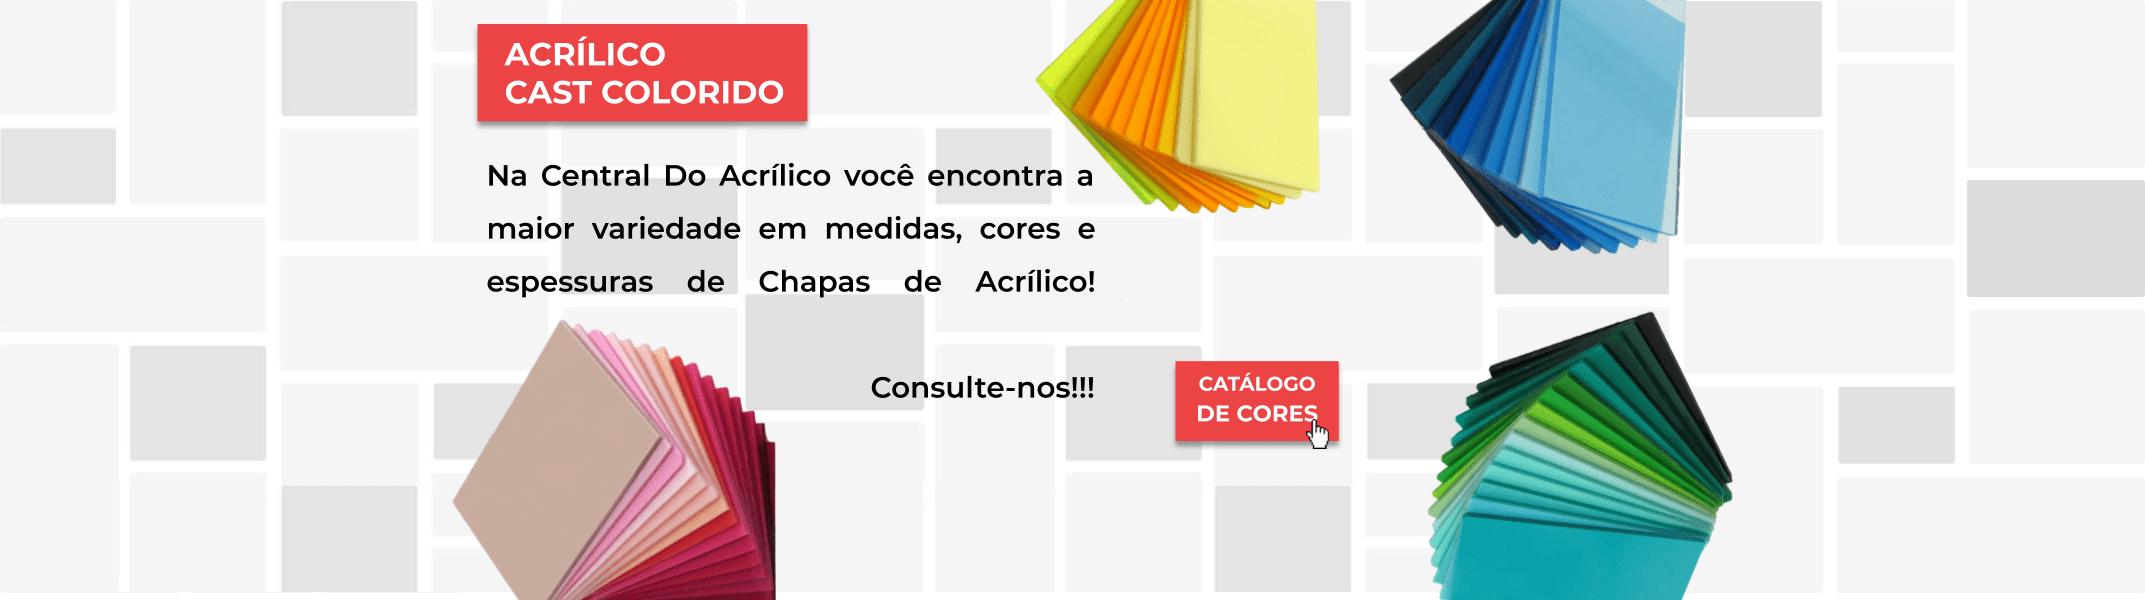 Banner_Acrilico_Colorido-min